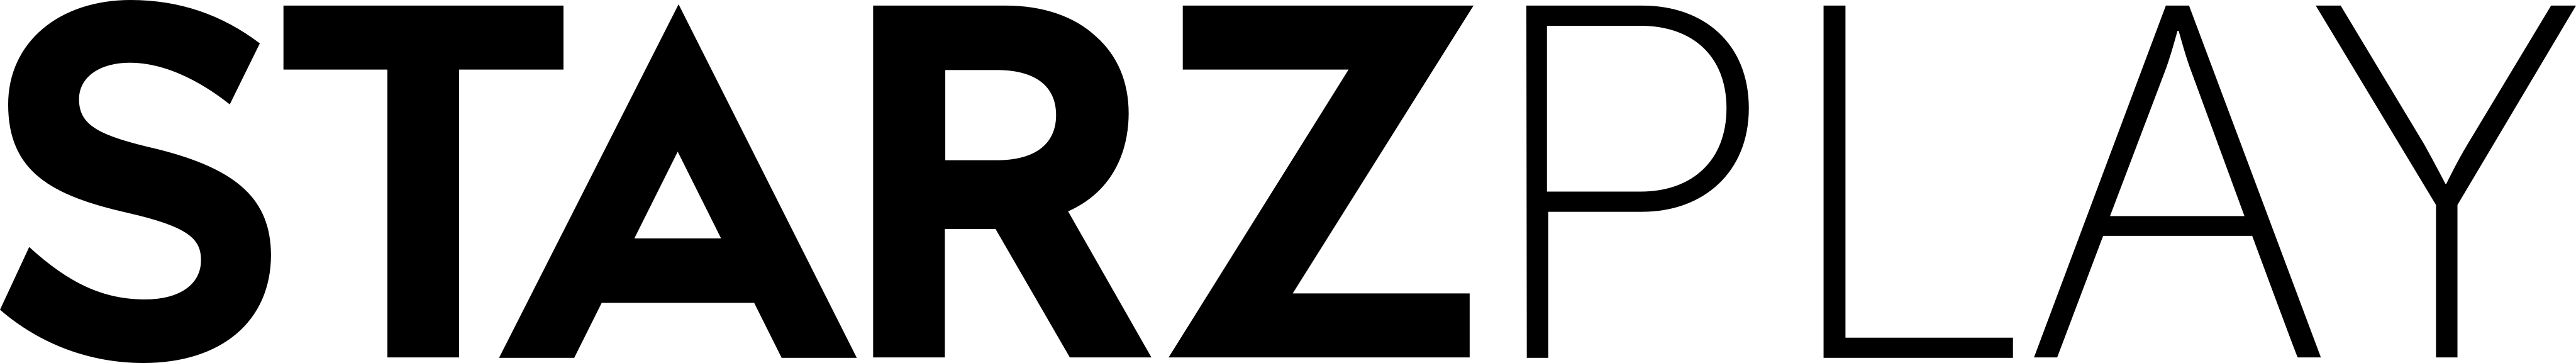 STARZPLAY Logo.